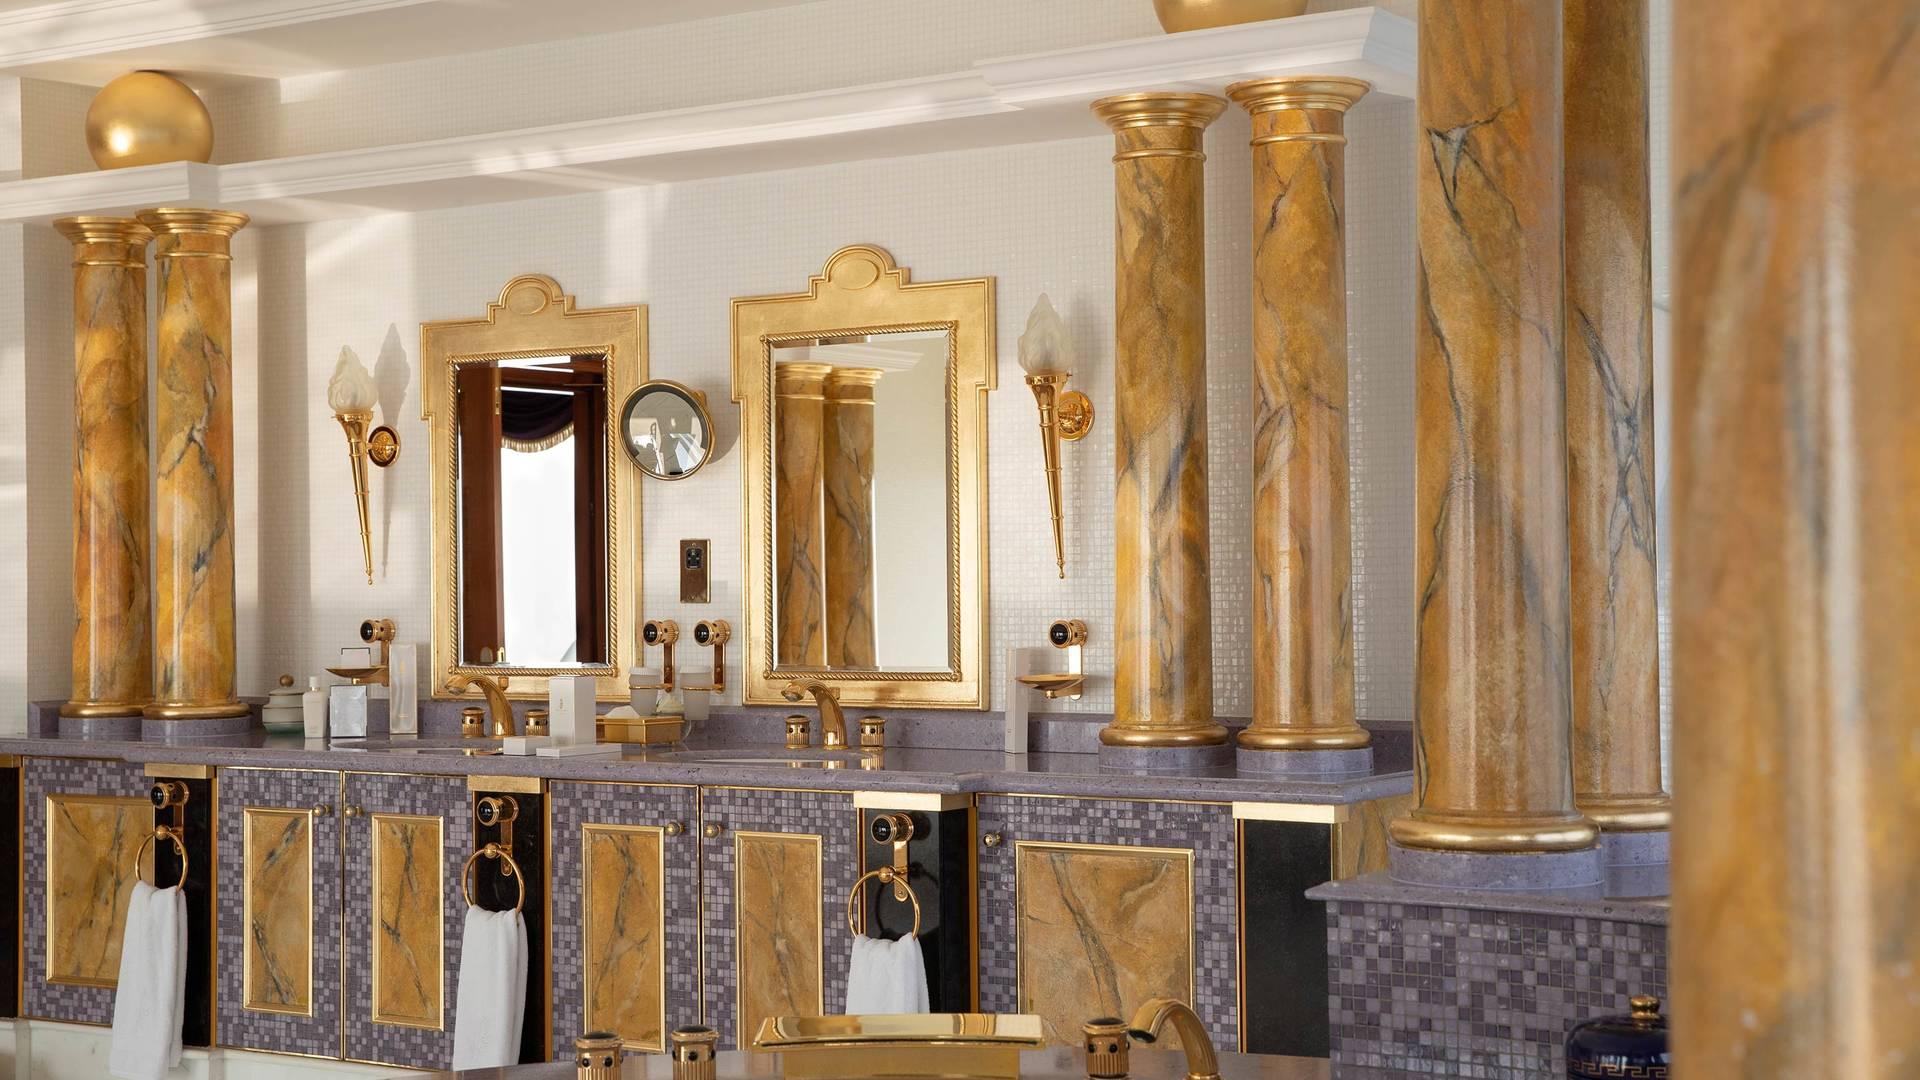 Jumeirah Burj Al Arab Presidential suite bathroom_16-9